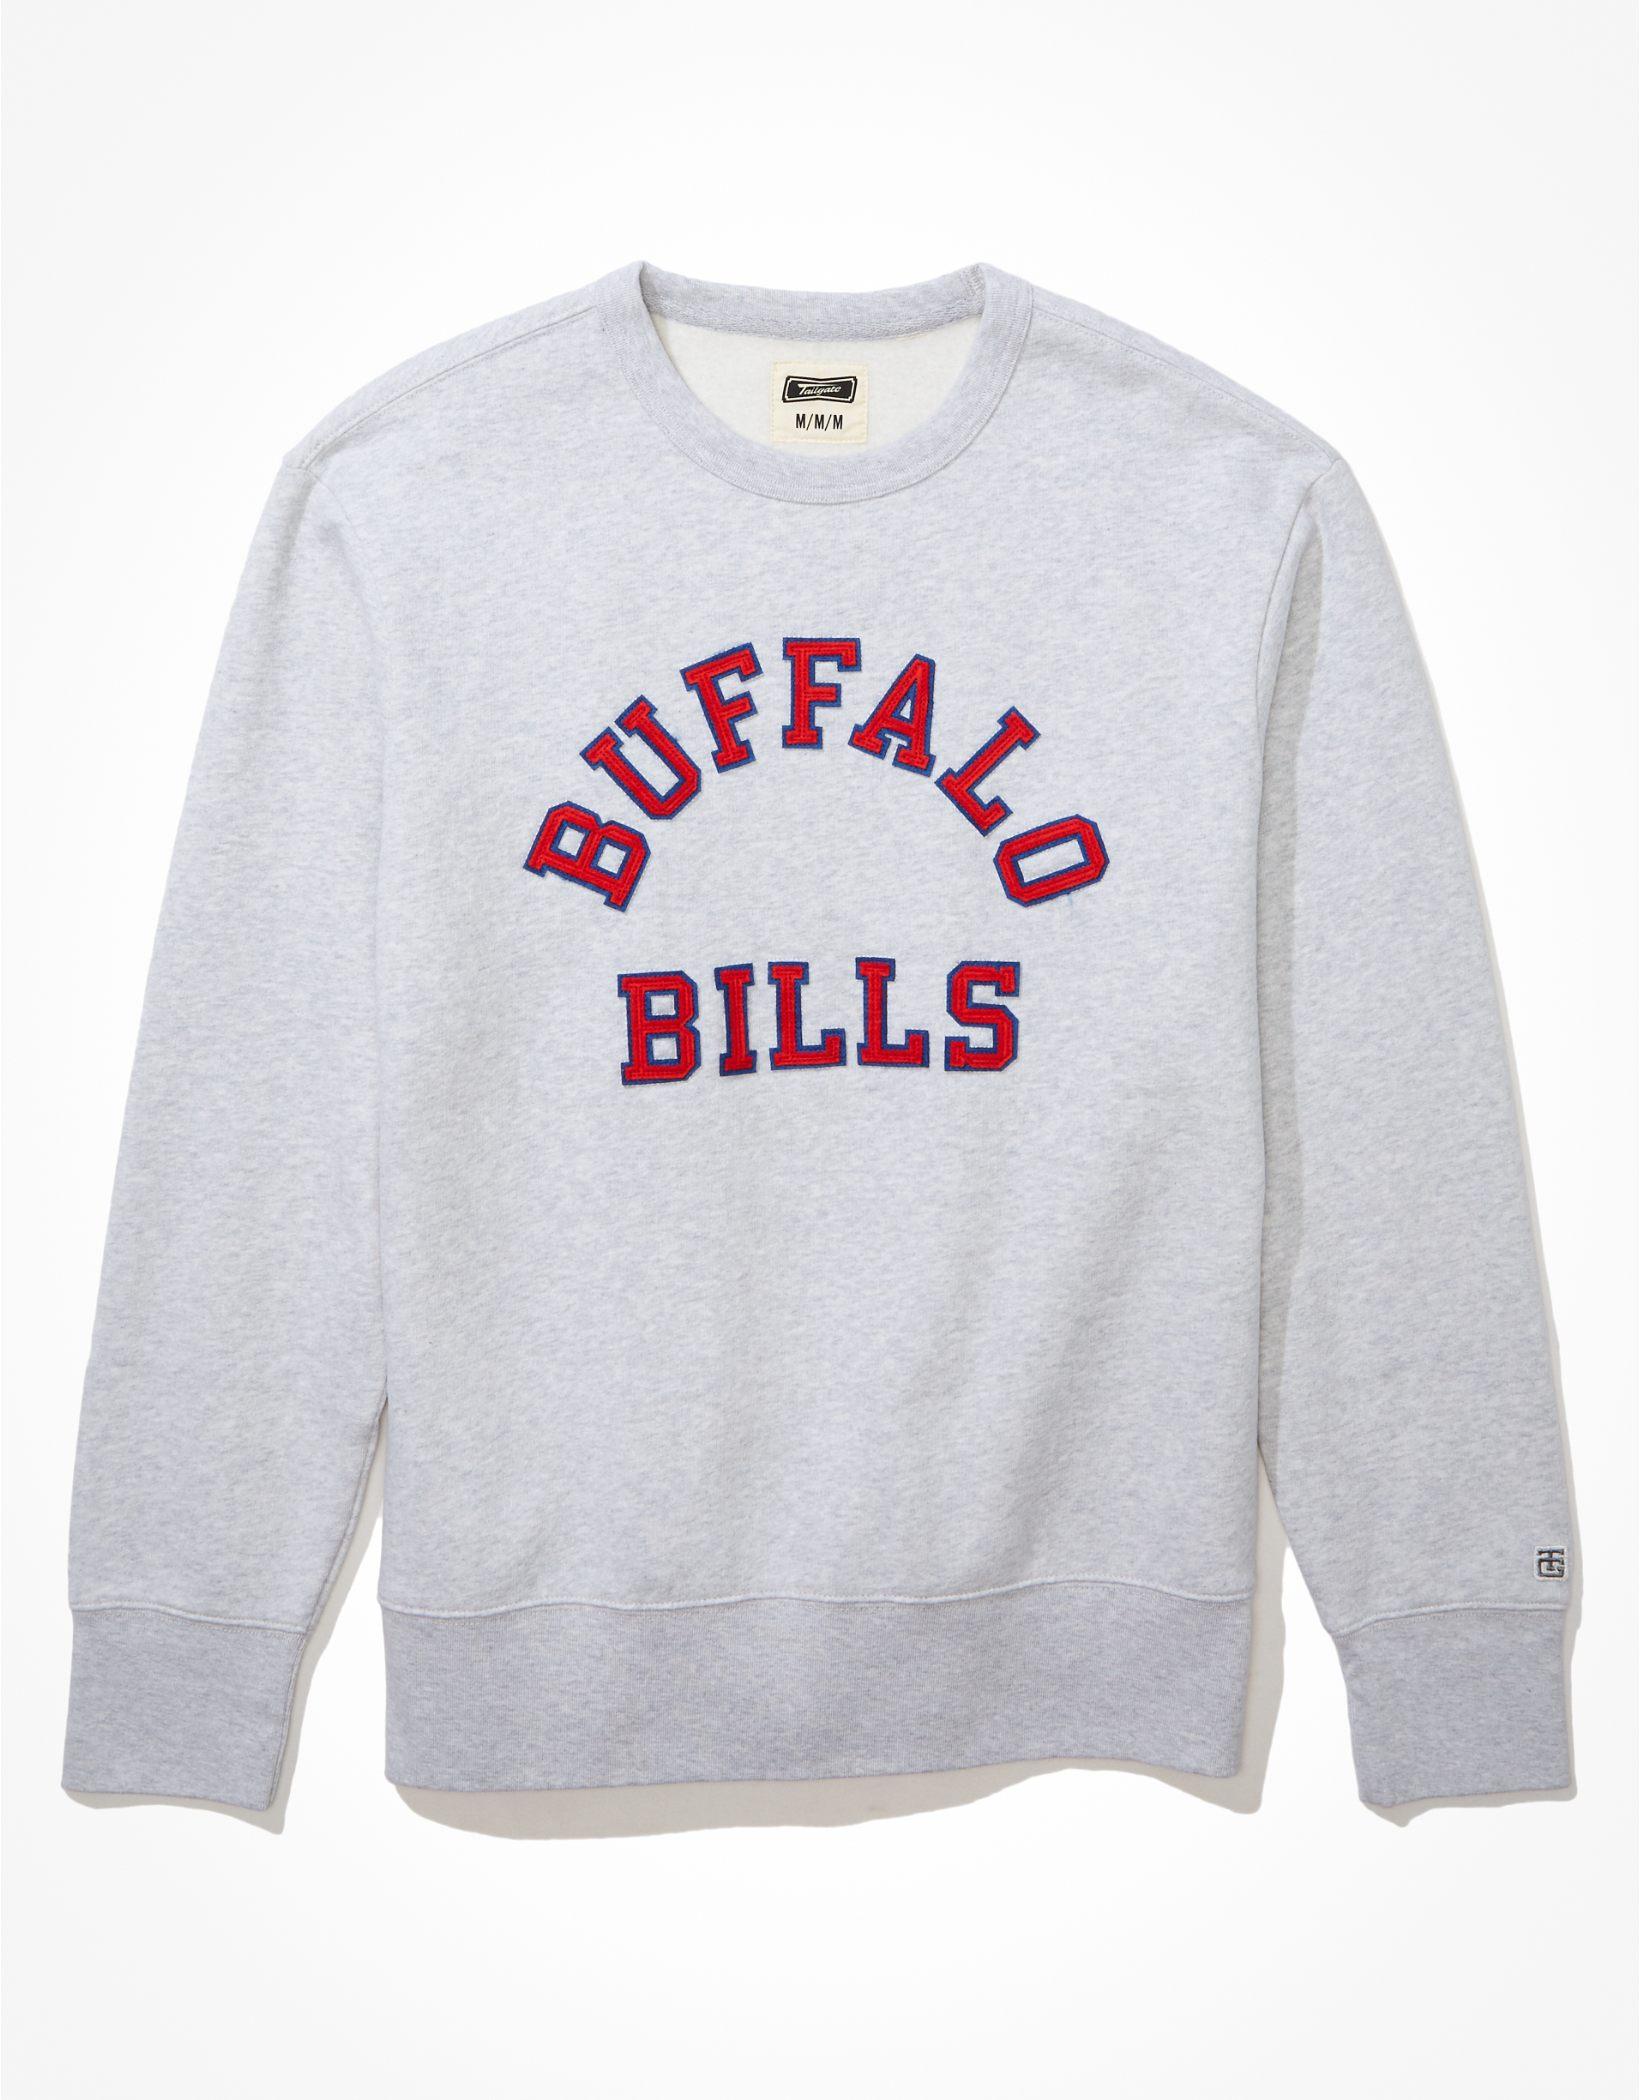 Tailgate Men's Buffalo Bills Fleece Crew Neck Sweatshirt